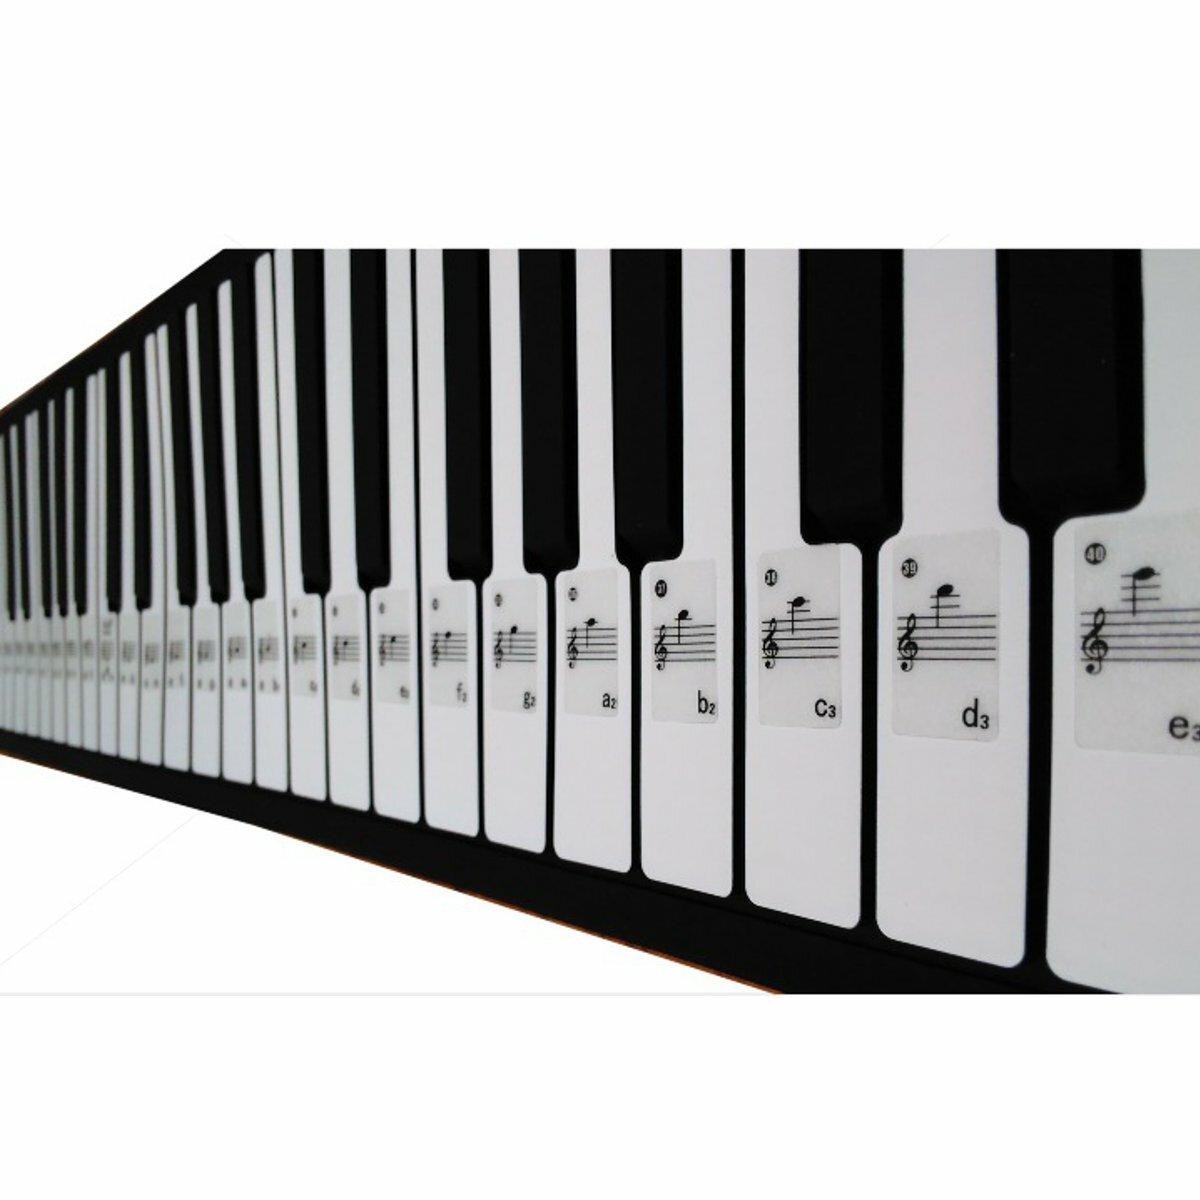 Piano Keyboard Musical Note Sticker for 61 Keys Electronic Keyboard Piano